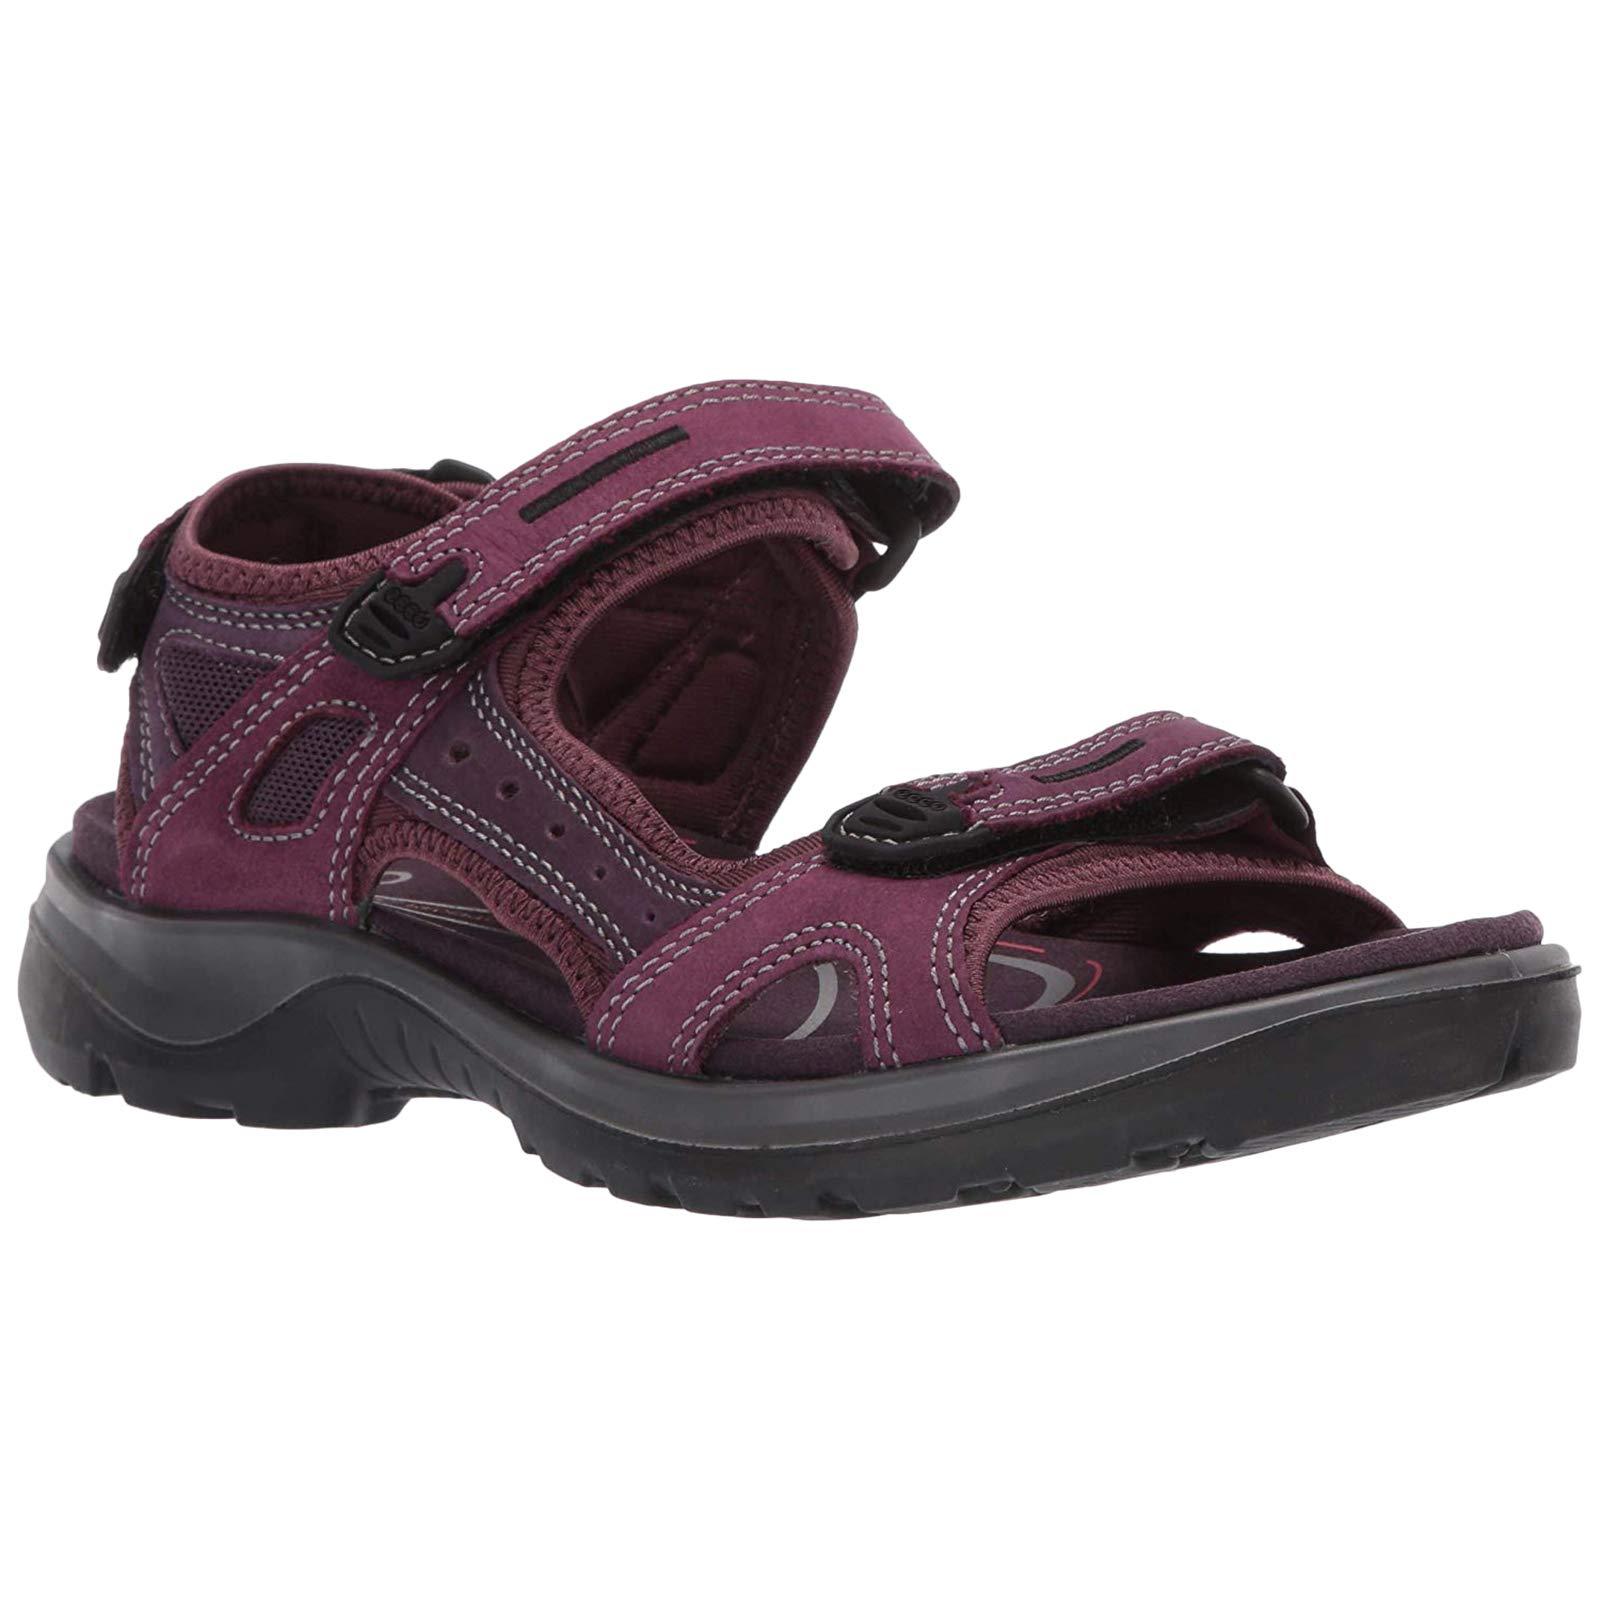 Details about ECCO Women's Yucatan outdoor offroad hiking sandal Choose SZcolor